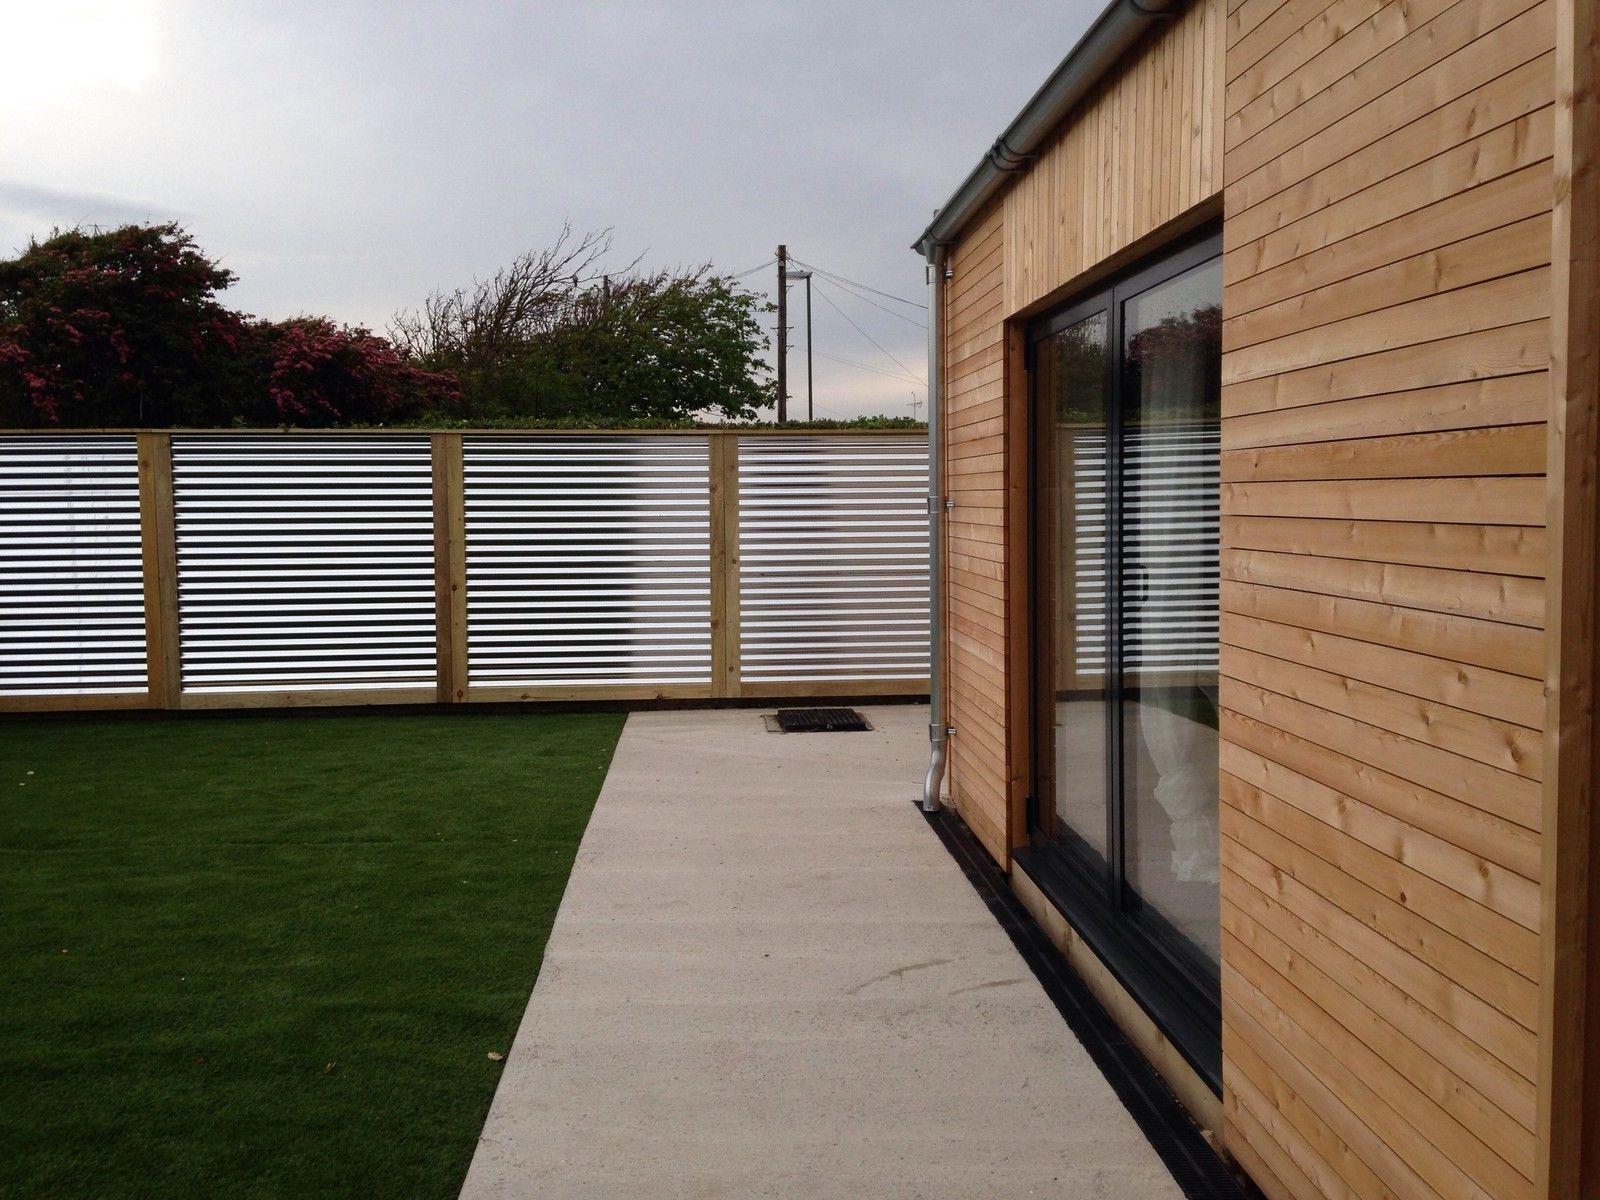 corrugated metal fence panels. Corrugated Metal Fence Panels In Garden \u0026 Patio, Fencing, | EBay 2